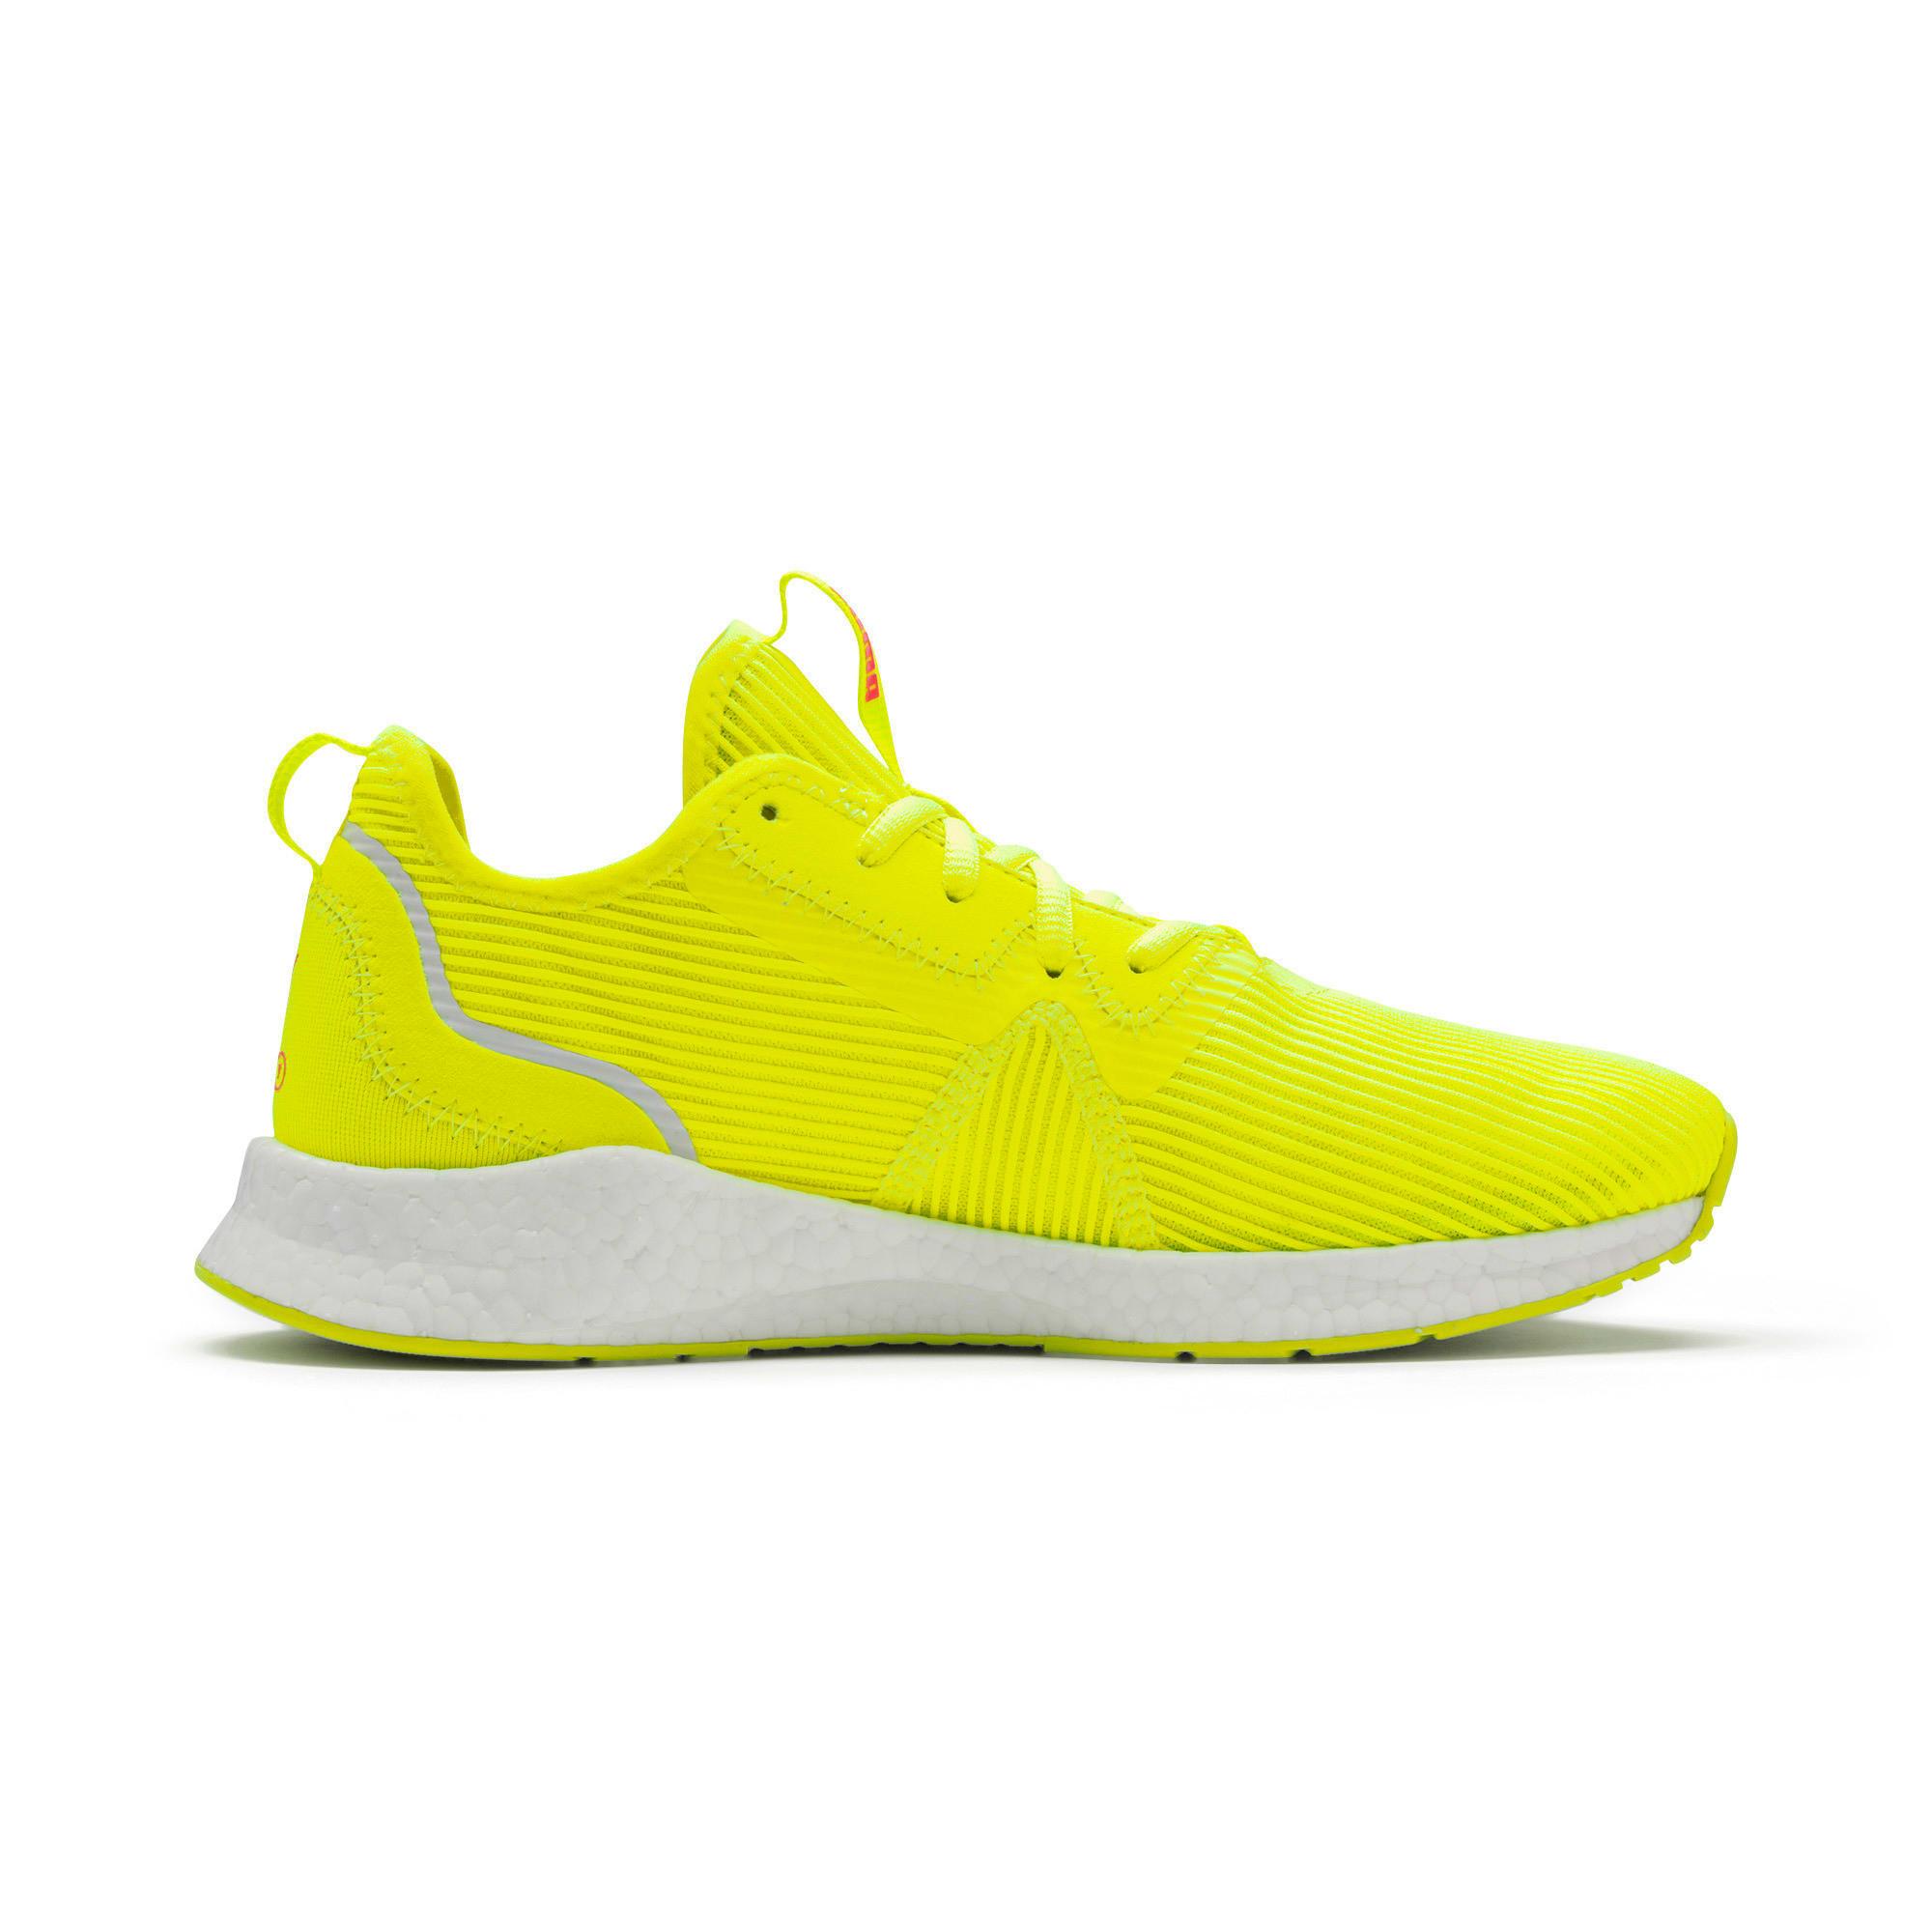 Miniatura 6 de Zapatos para correr NRGY Star Femme para mujer, Yellow Alert-Pink Alert, mediano